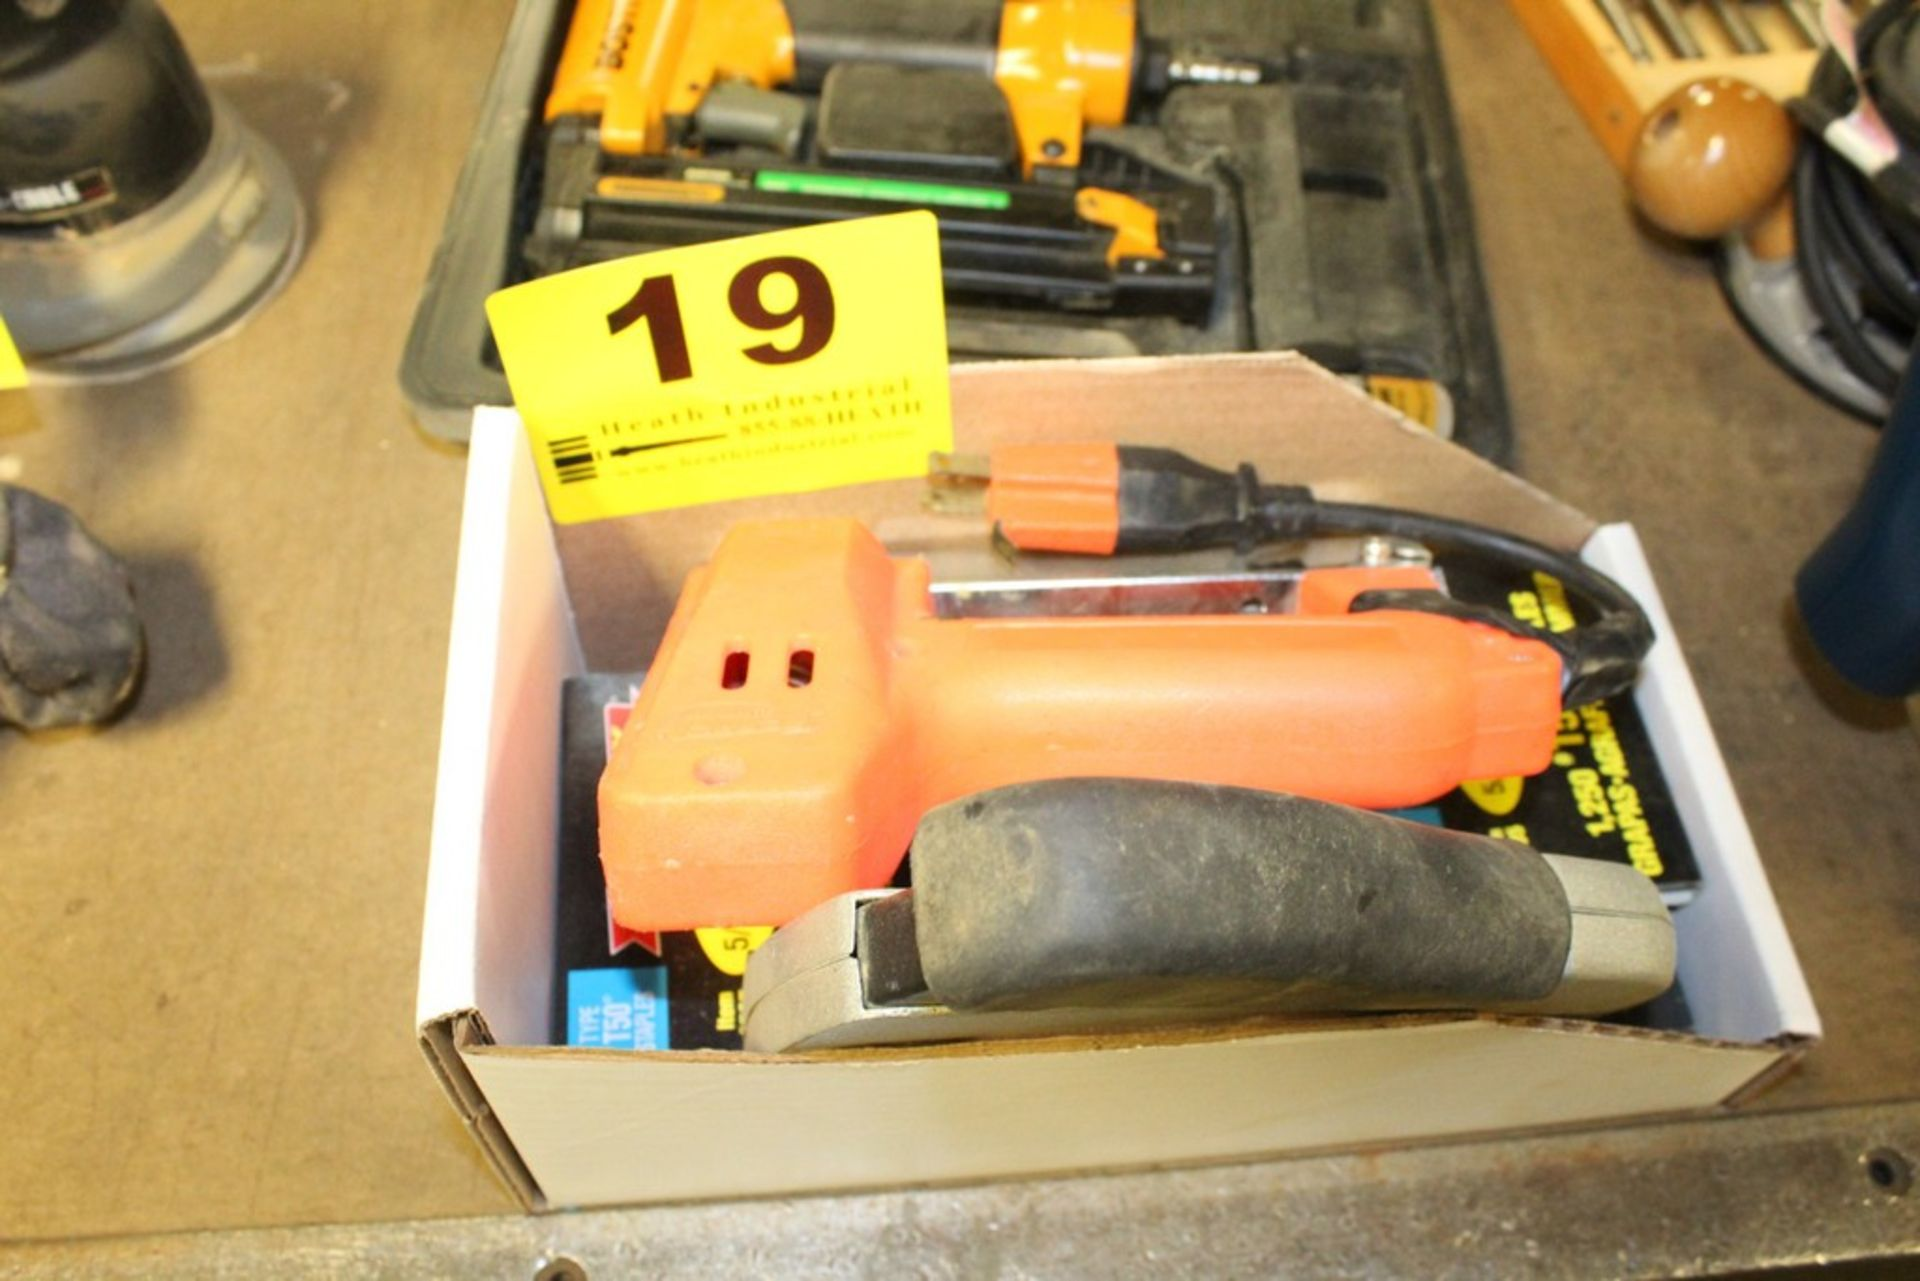 Lot 19 - ARROW MODEL ETF50-BN ELECTRIC AND BLACK & DECKER POWER SHOT STAPLE GUNS AND SUPPLIES IN BOX